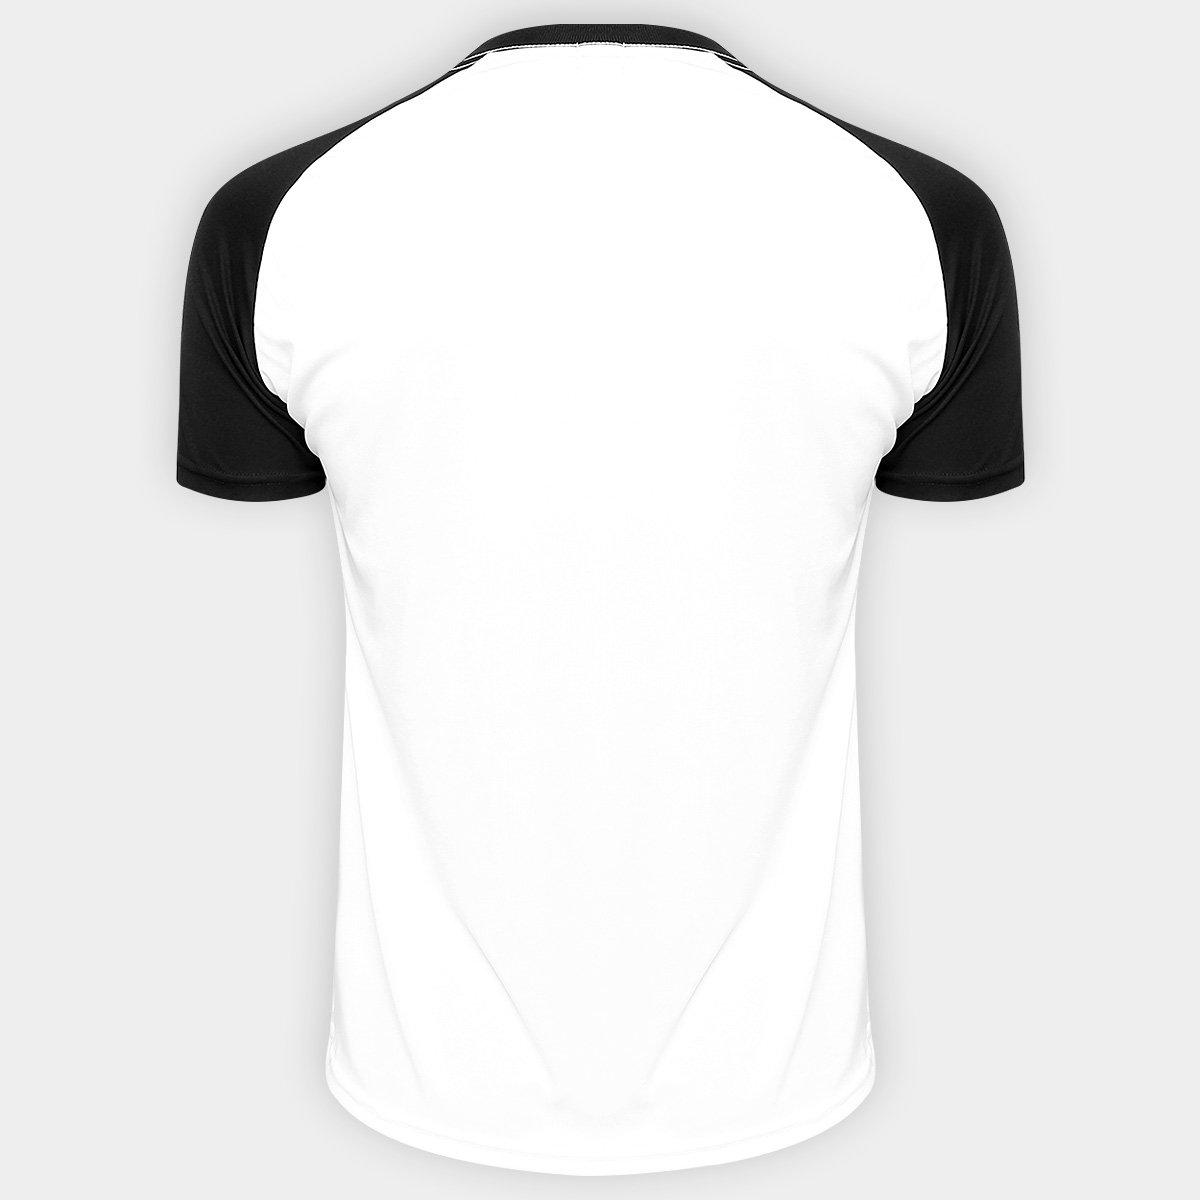 Camiseta Santos Lima 17 Masculina  Camiseta Santos Lima 17 Masculina ... e8356d0d3a486